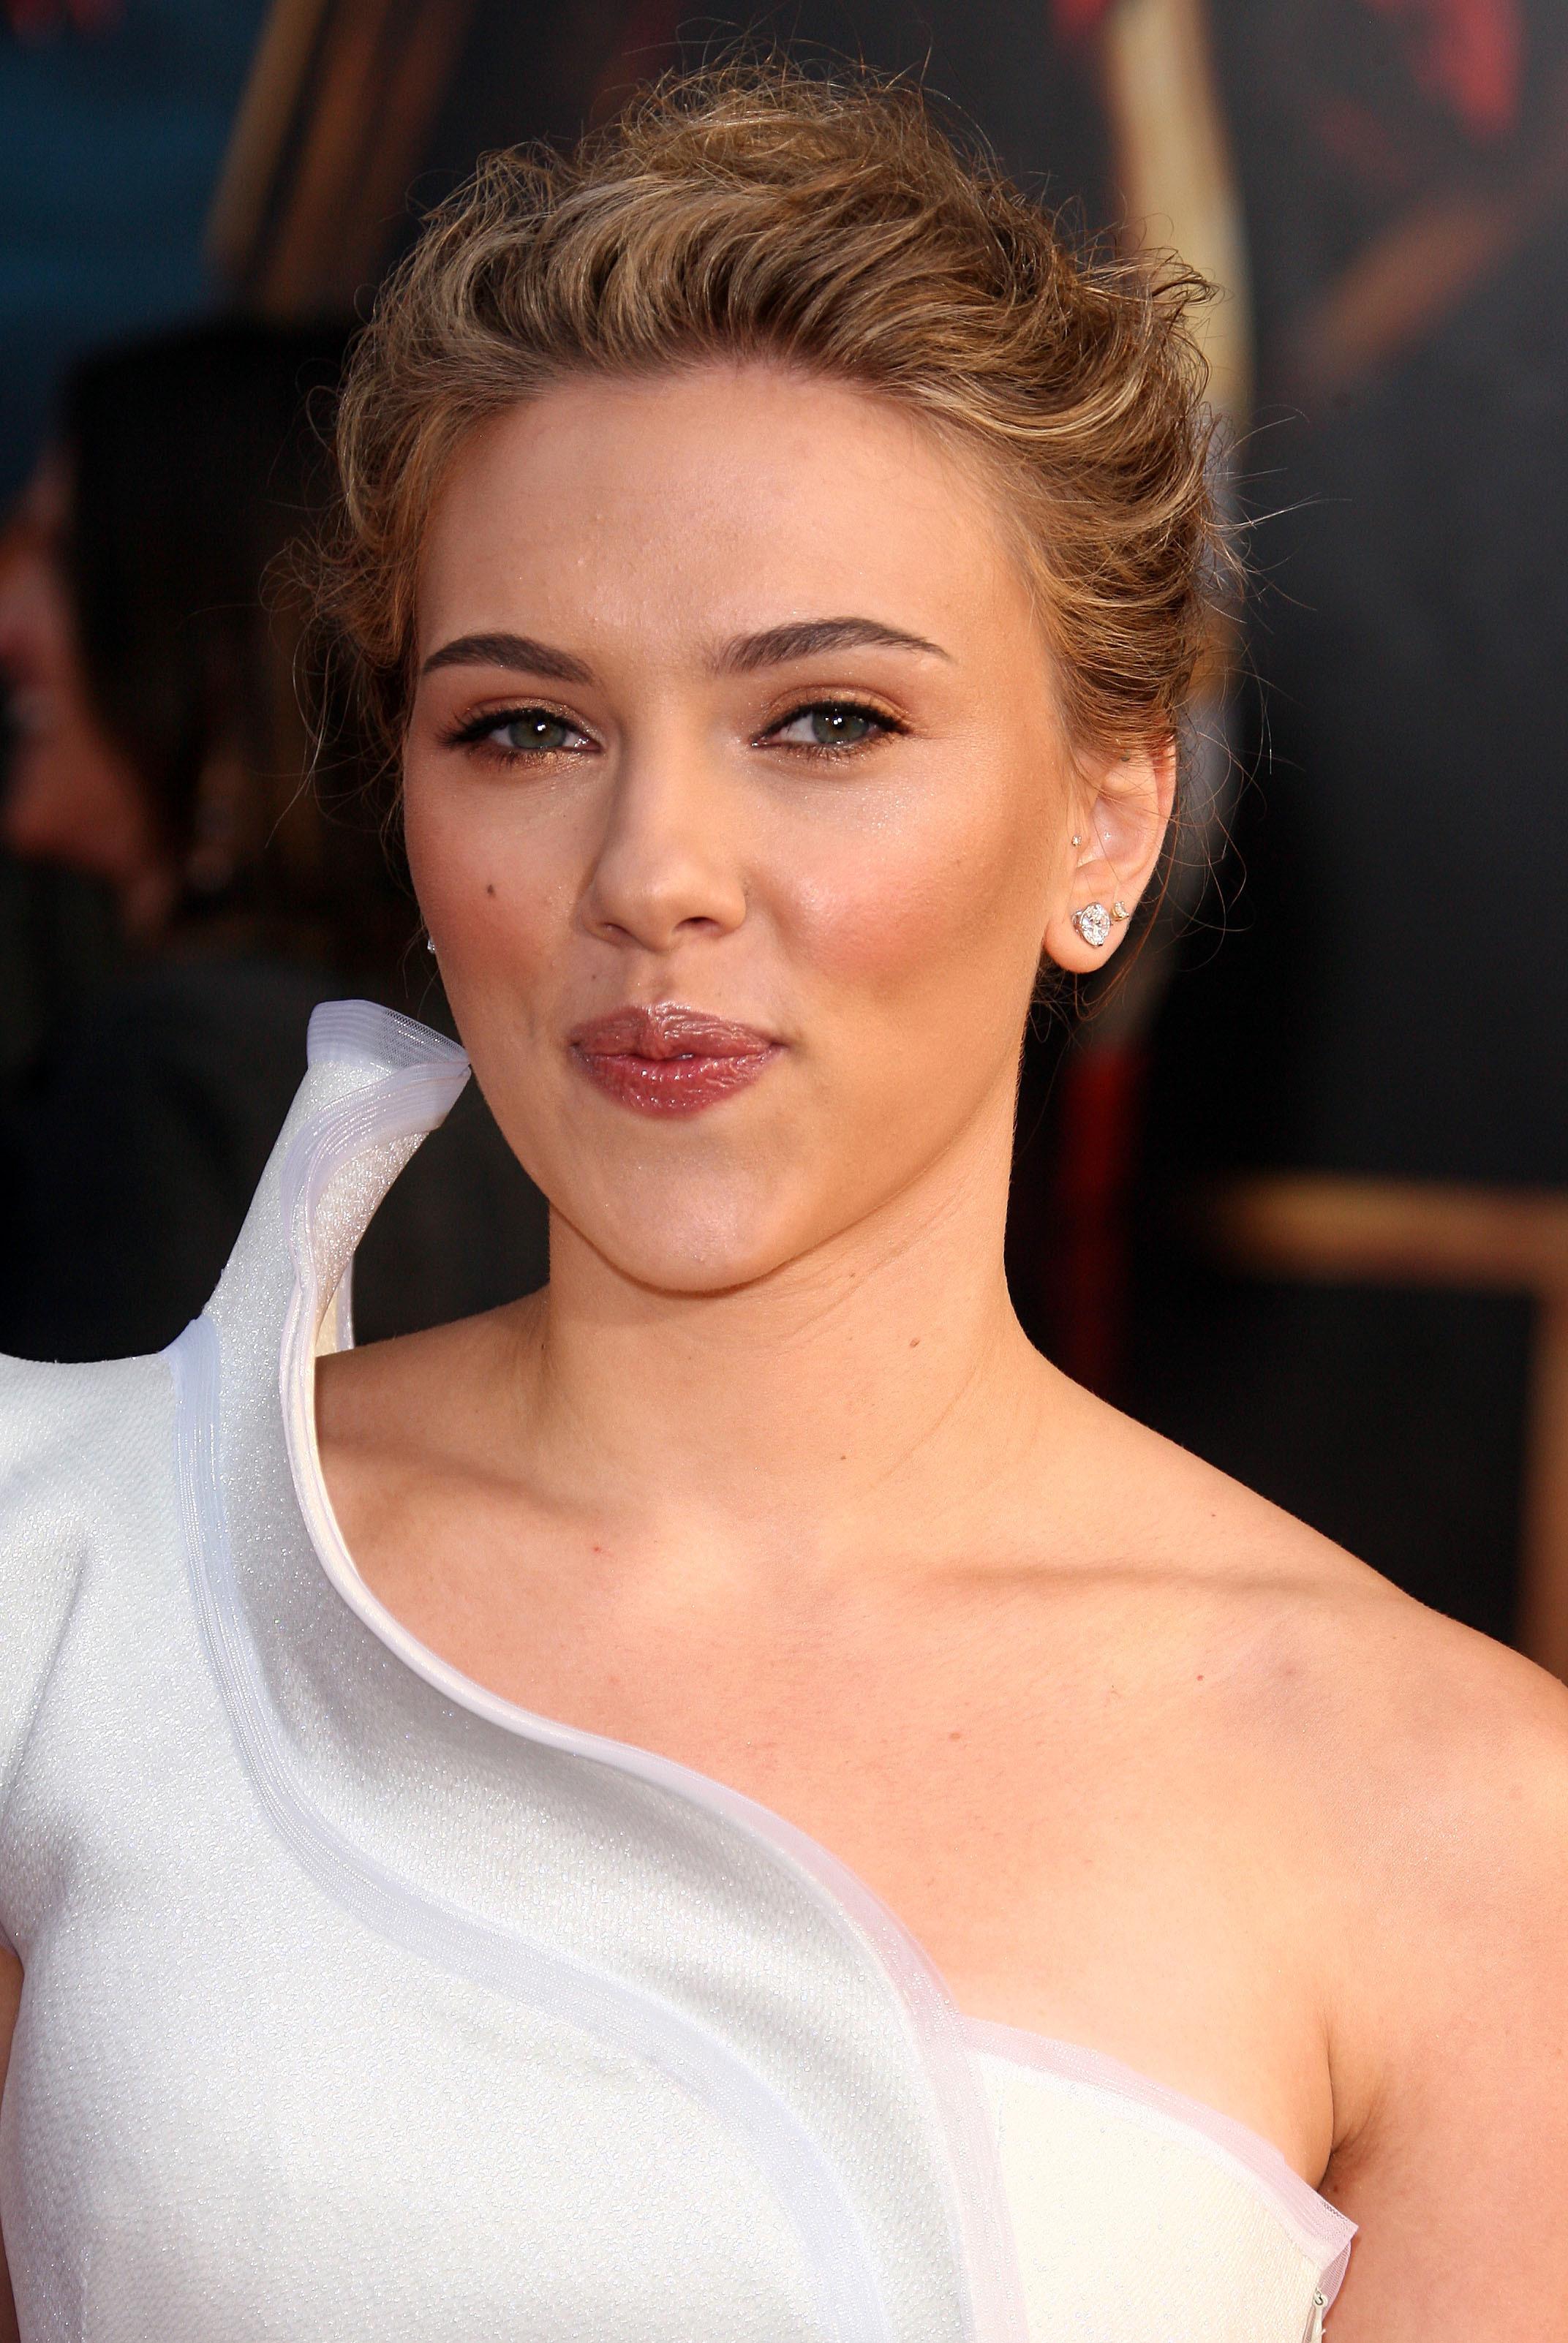 50689_celebrity_paradise.com_Scarlett_Johansson_Iron_Man_2_World_Premiere_in_Hollywood_26.04.2010_12_122_431lo.jpg